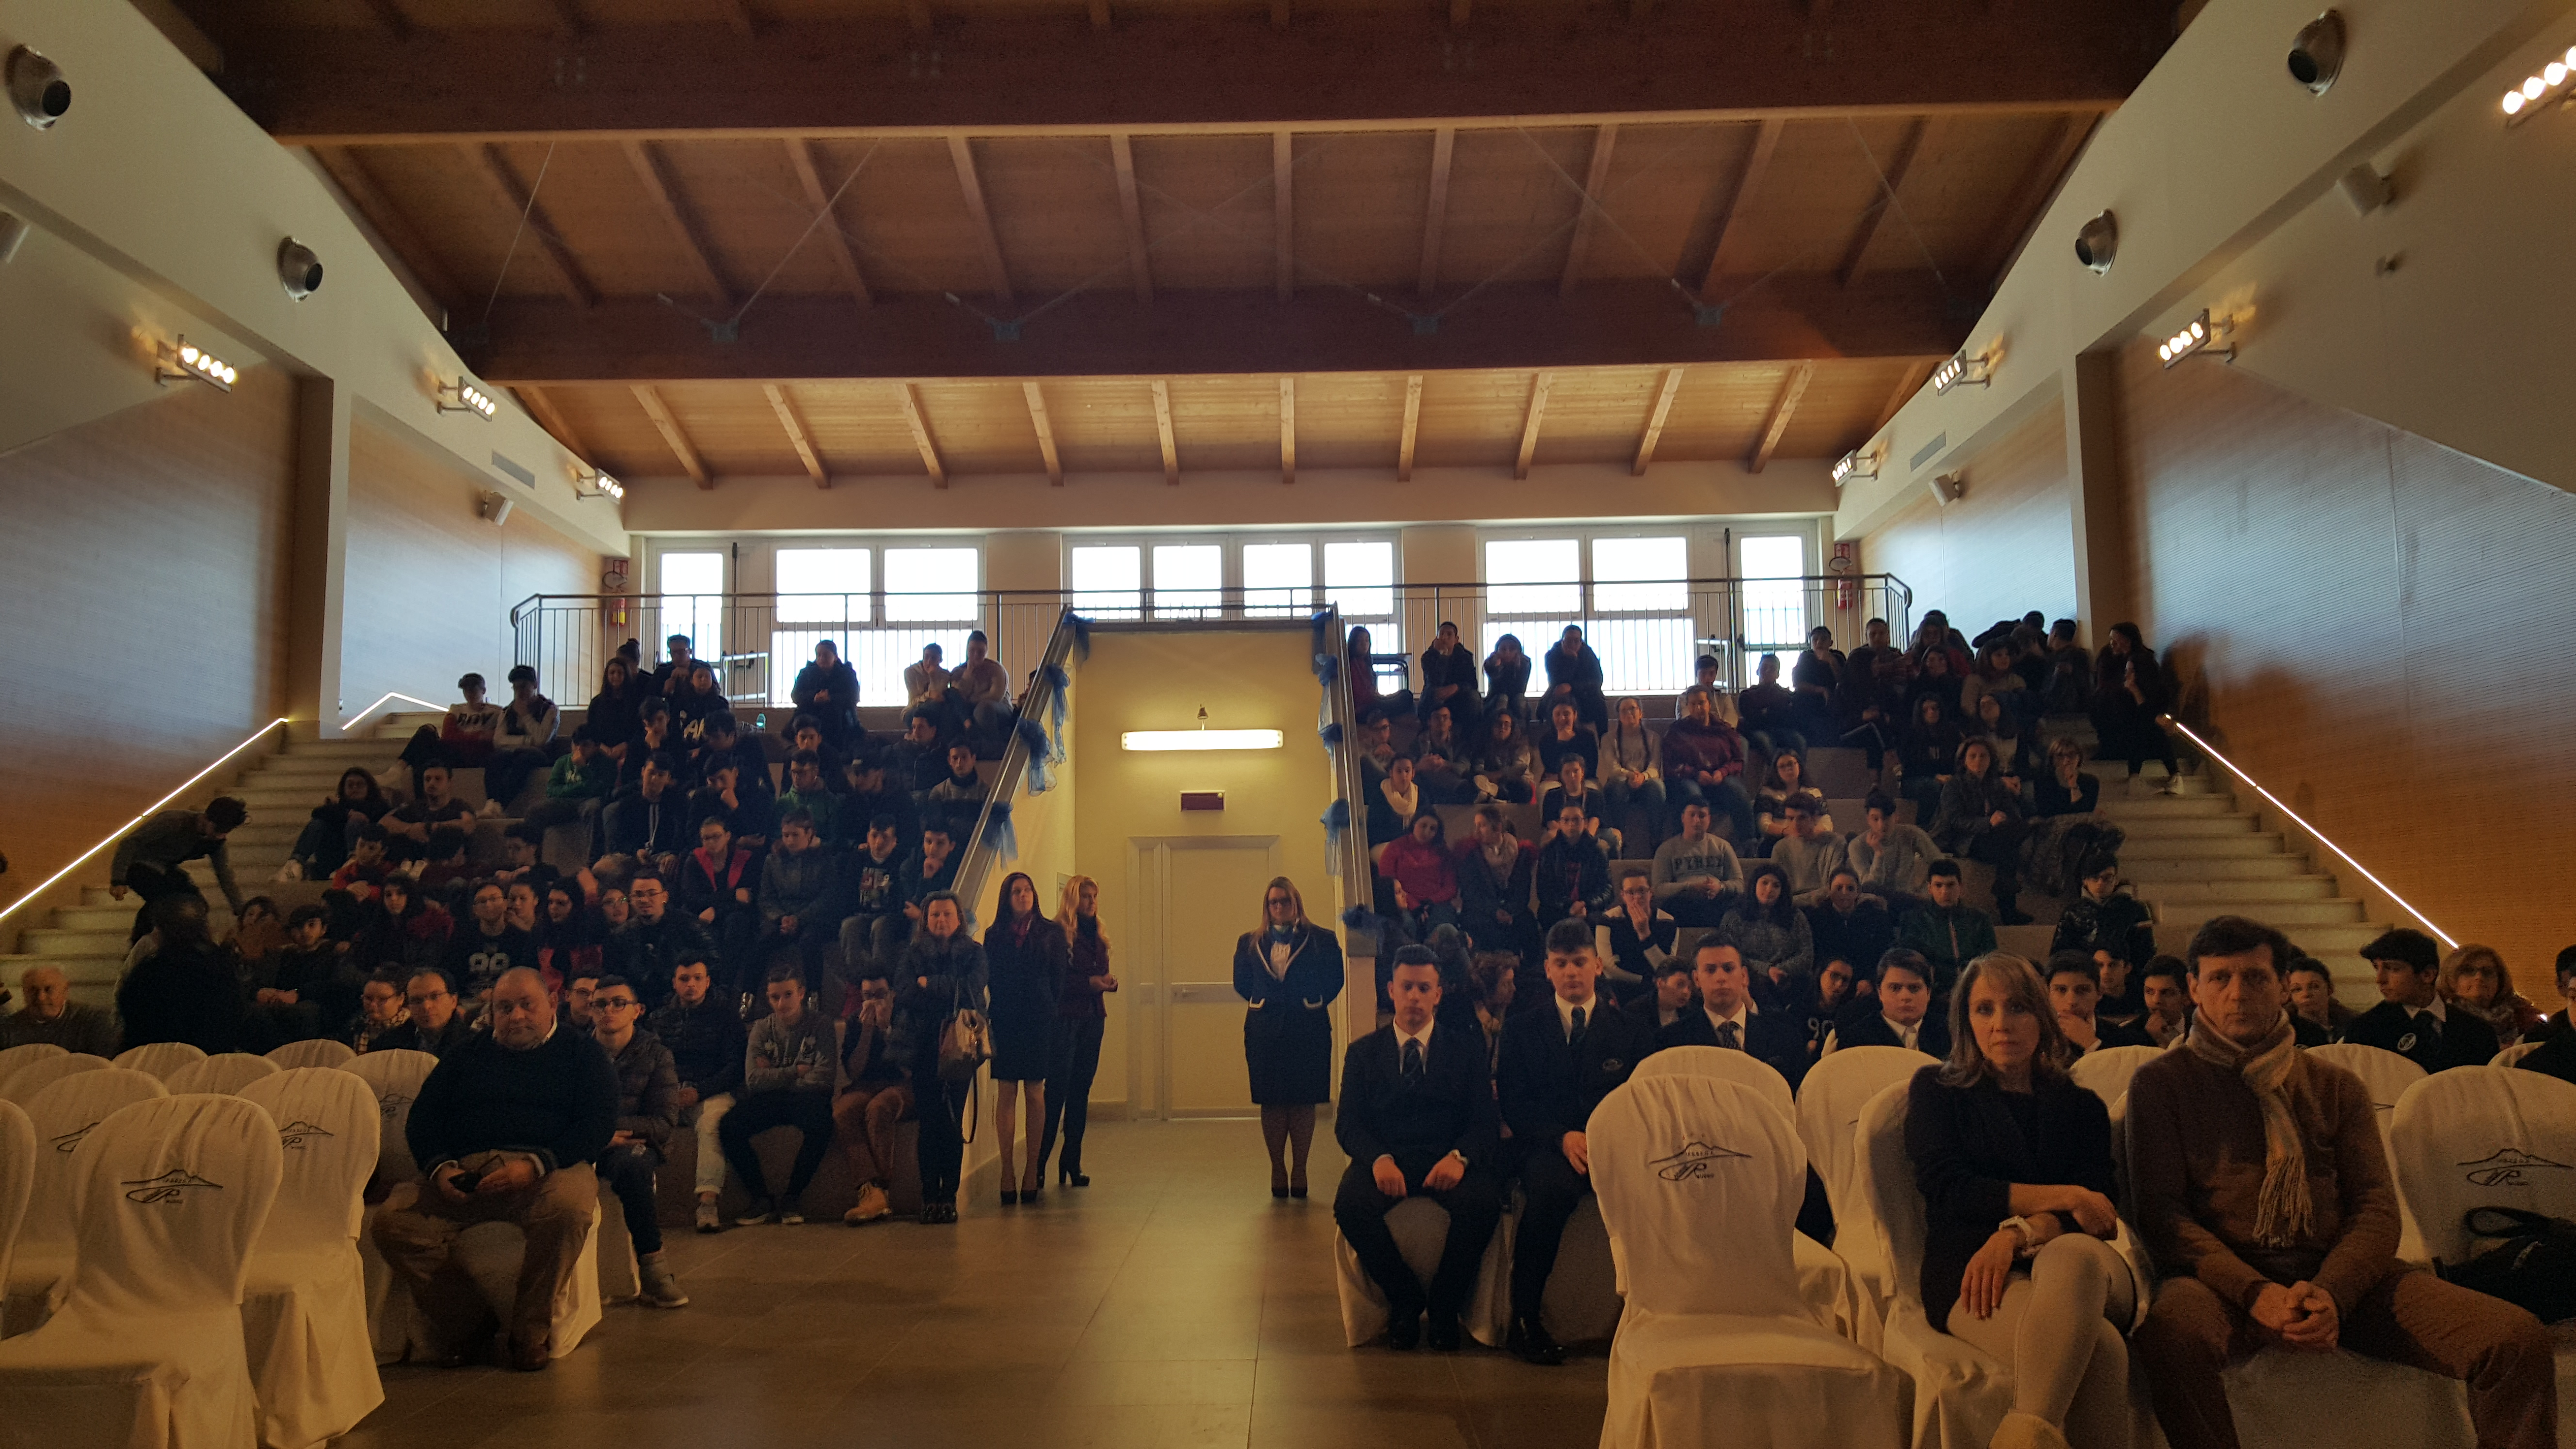 Intervento ADA Campania c/o IPSSEOA Carmine Russo di Cicciano | 27 Gen 2017